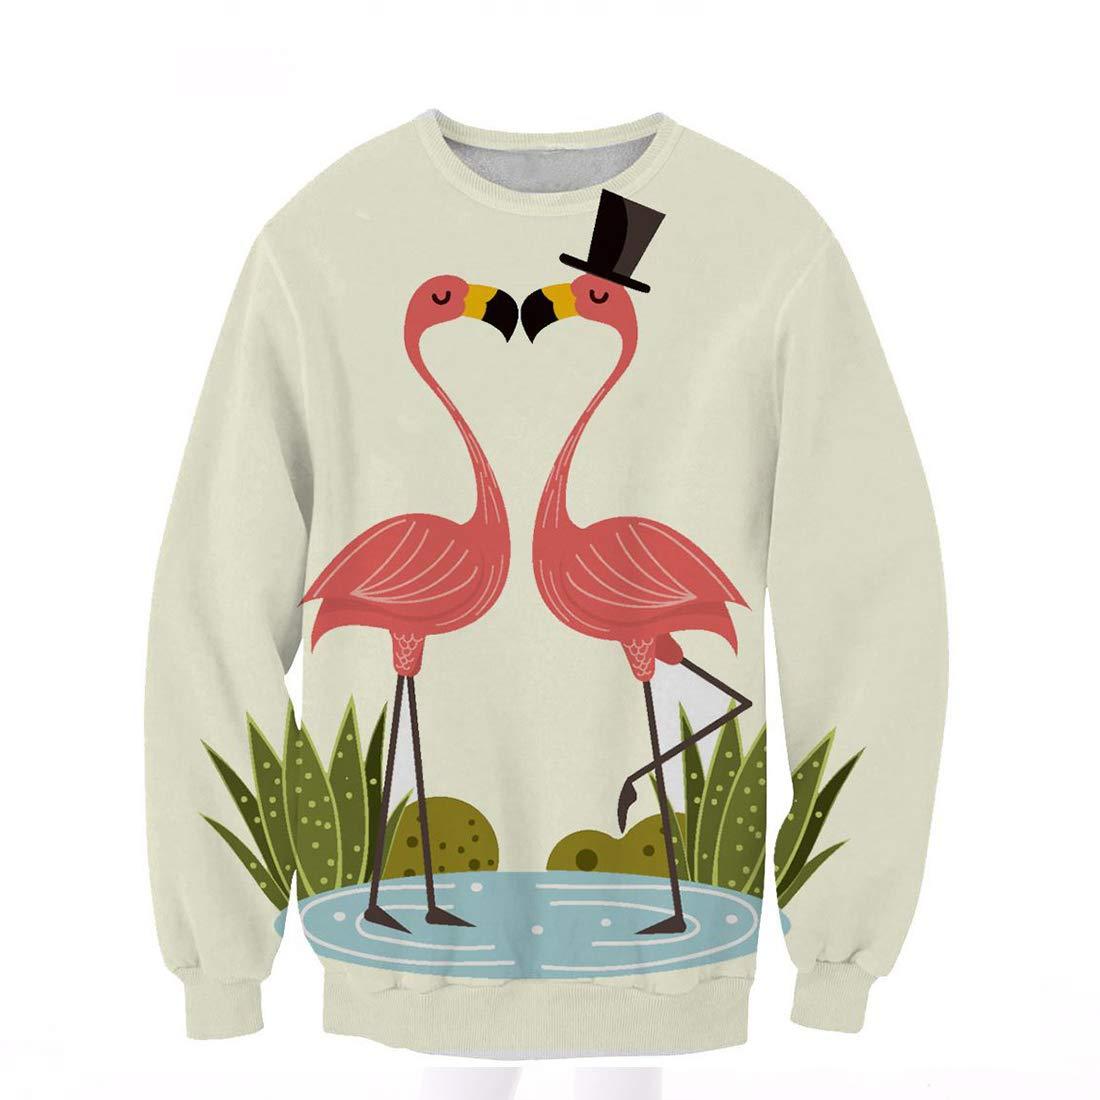 Pullcover Fashion Sweater Warm Hoodie Hip Hop Autumn Winter Jacket Coat for Kids FamyFirst Sweatshirt Printed Flamingo Long Sleeve Girl Boy